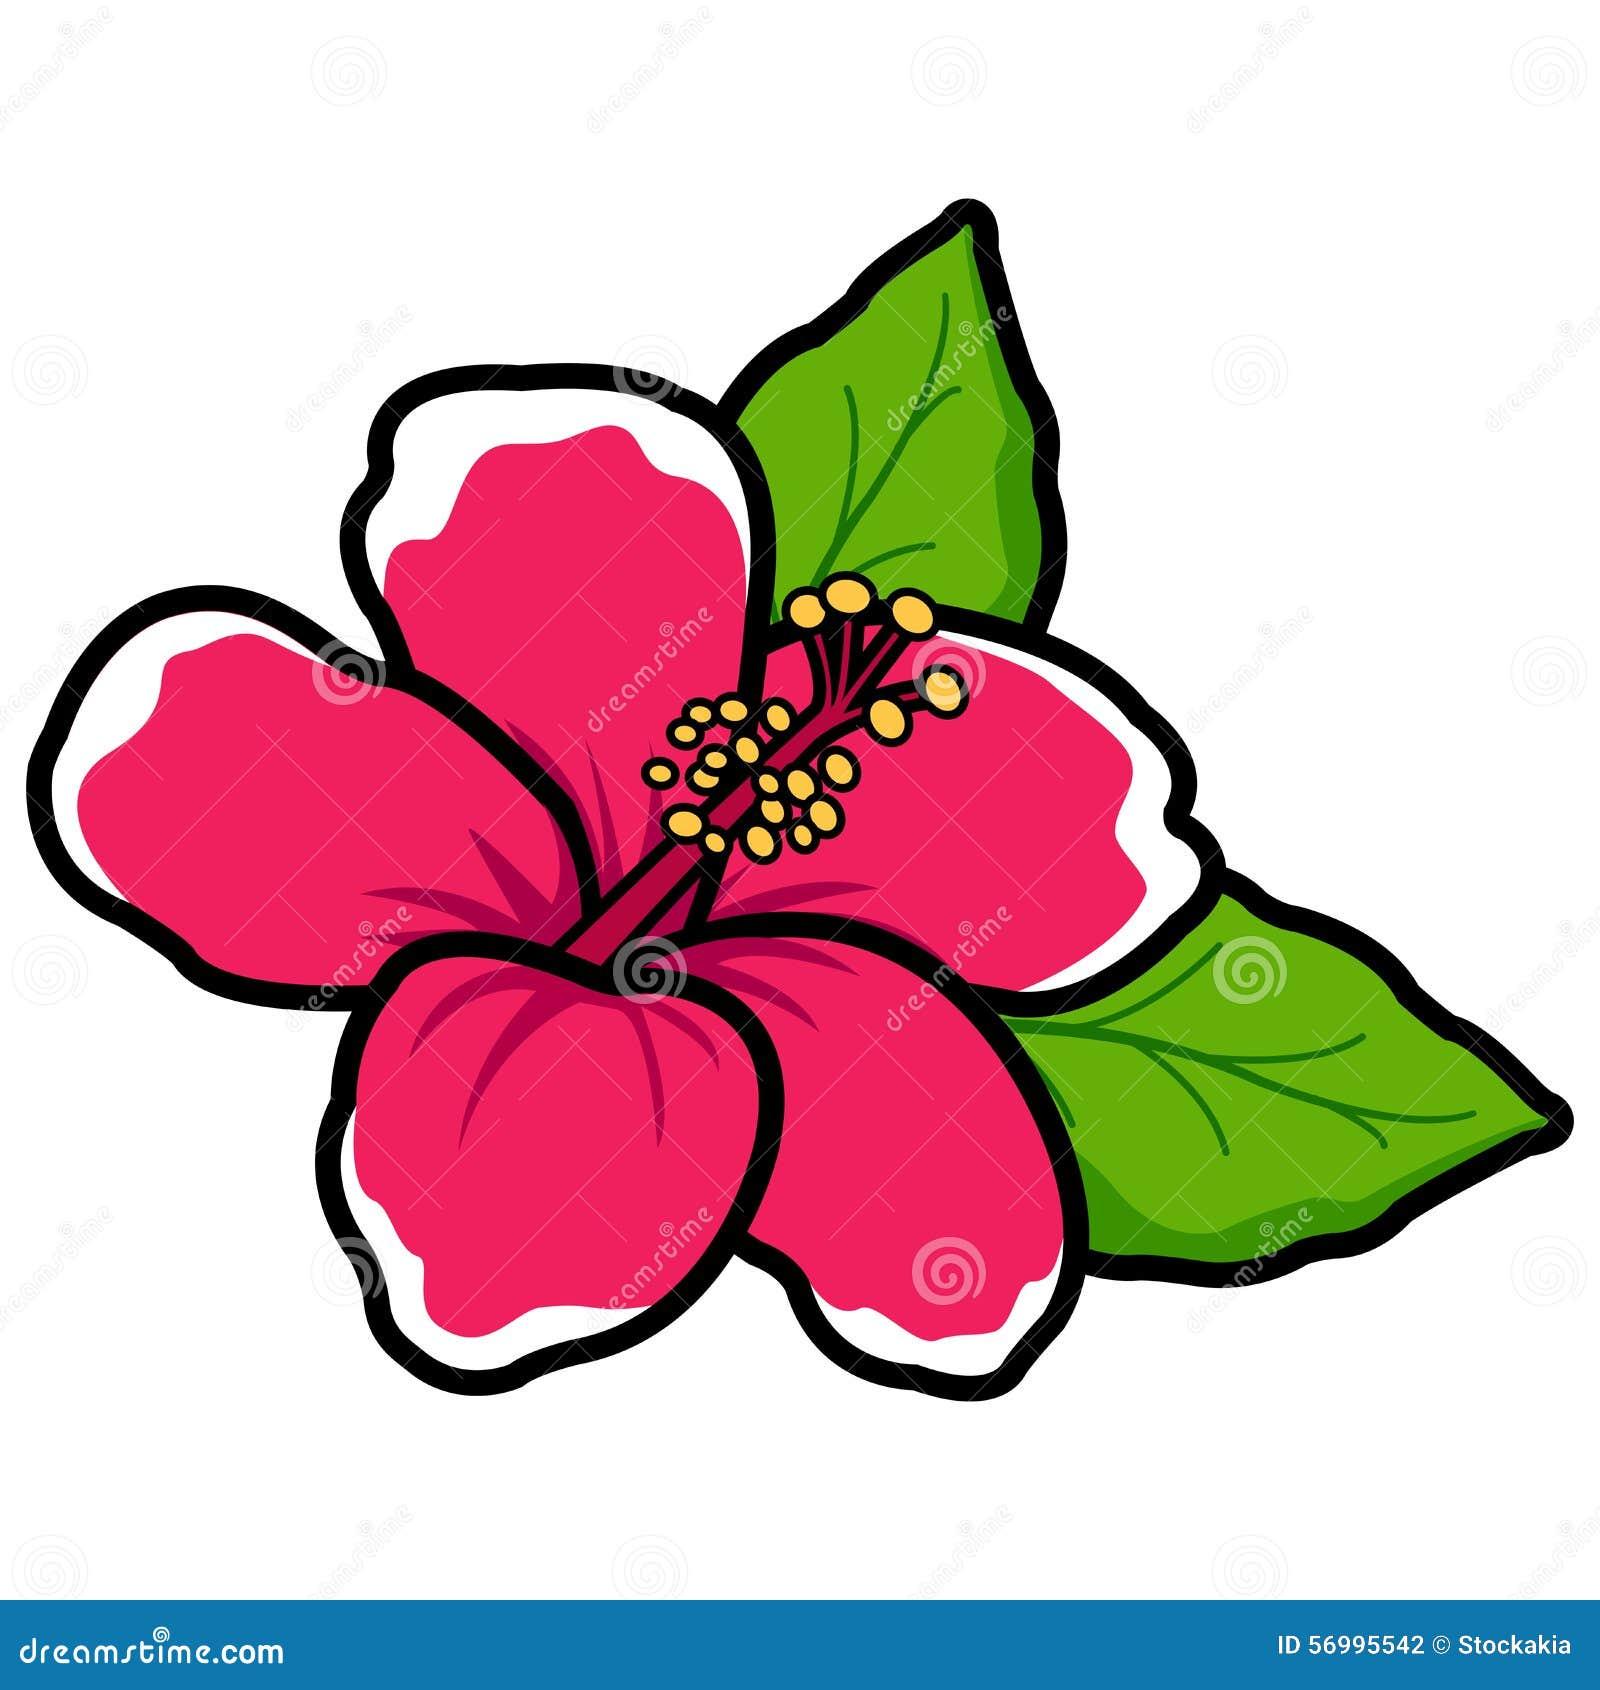 Hawaiian Hibiscus Flower Stock Vector Illustration Of Vector 56995542